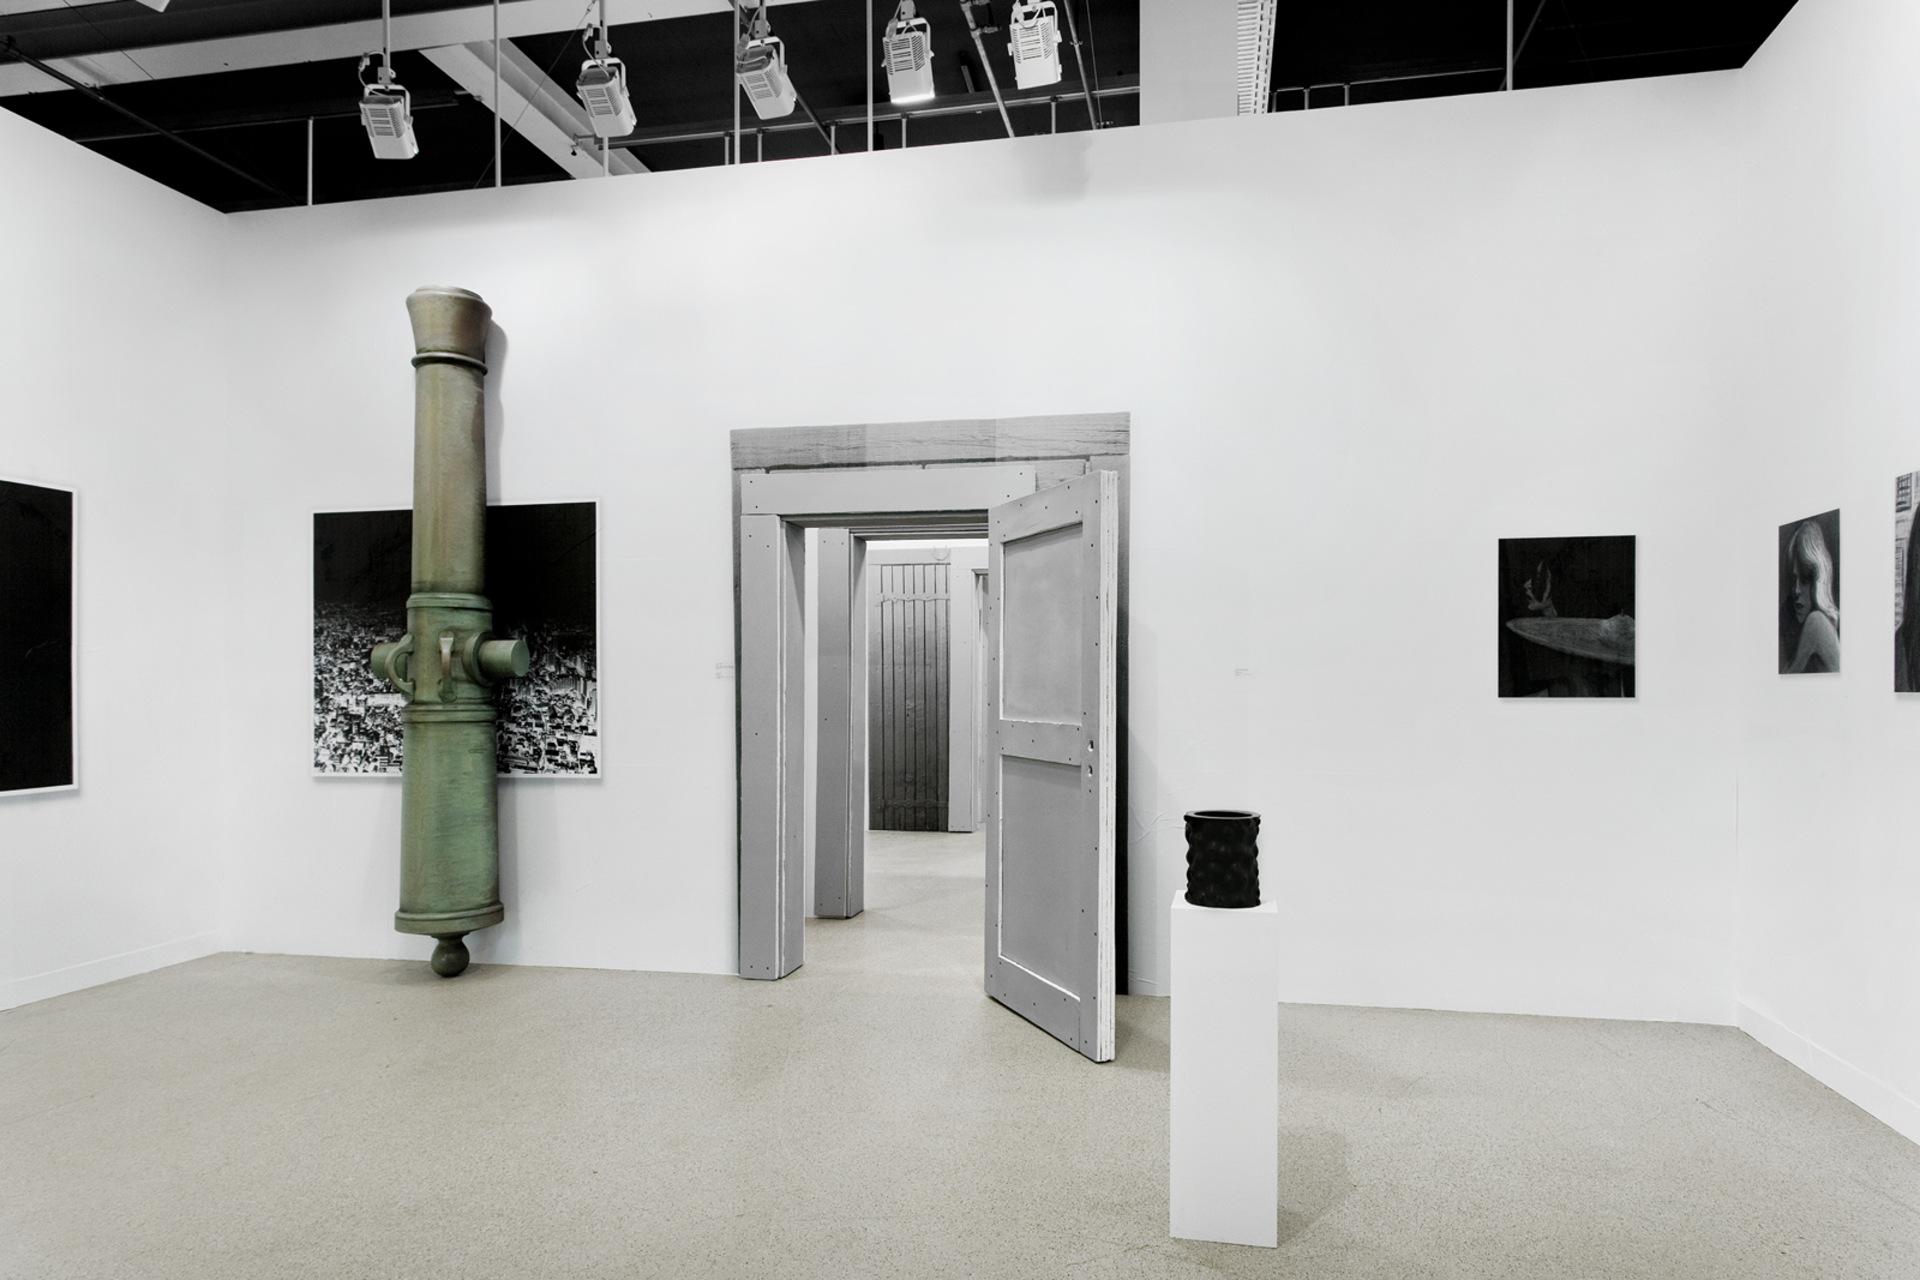 Untitled (Door); Last Call, Lascaux